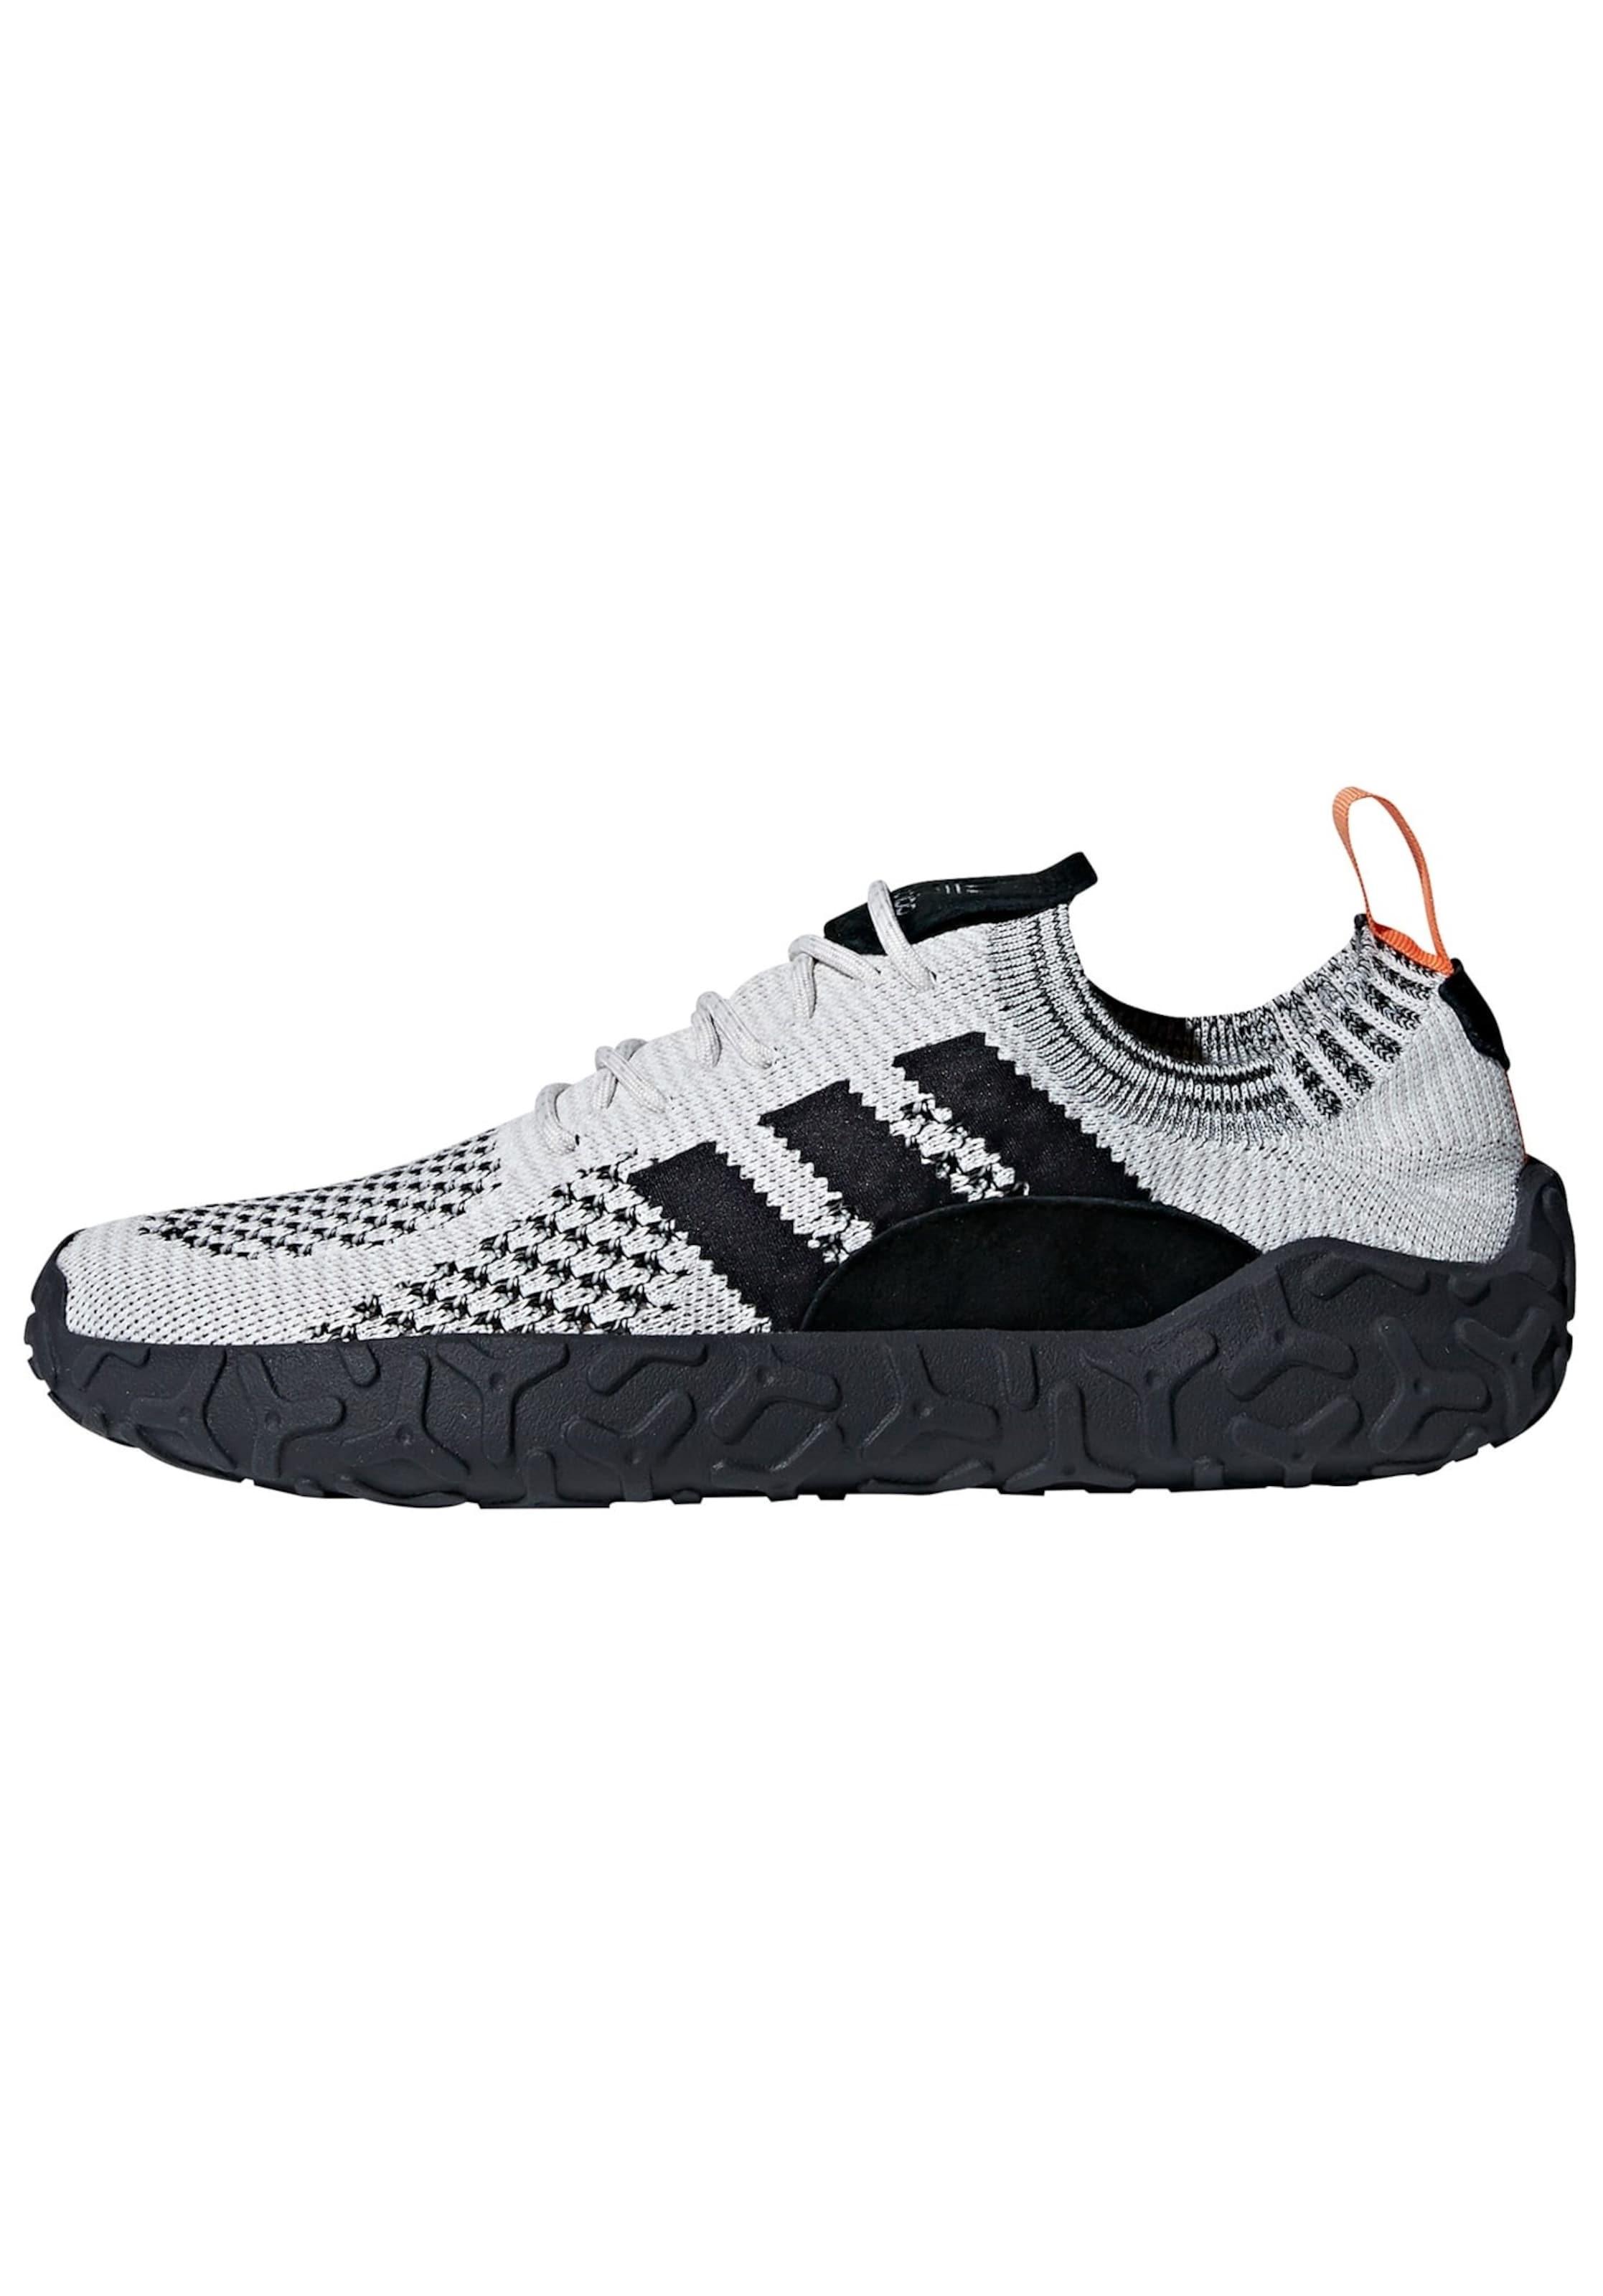 ADIDAS ORIGINALS Sneaker F/22 Pk Hohe Qualität